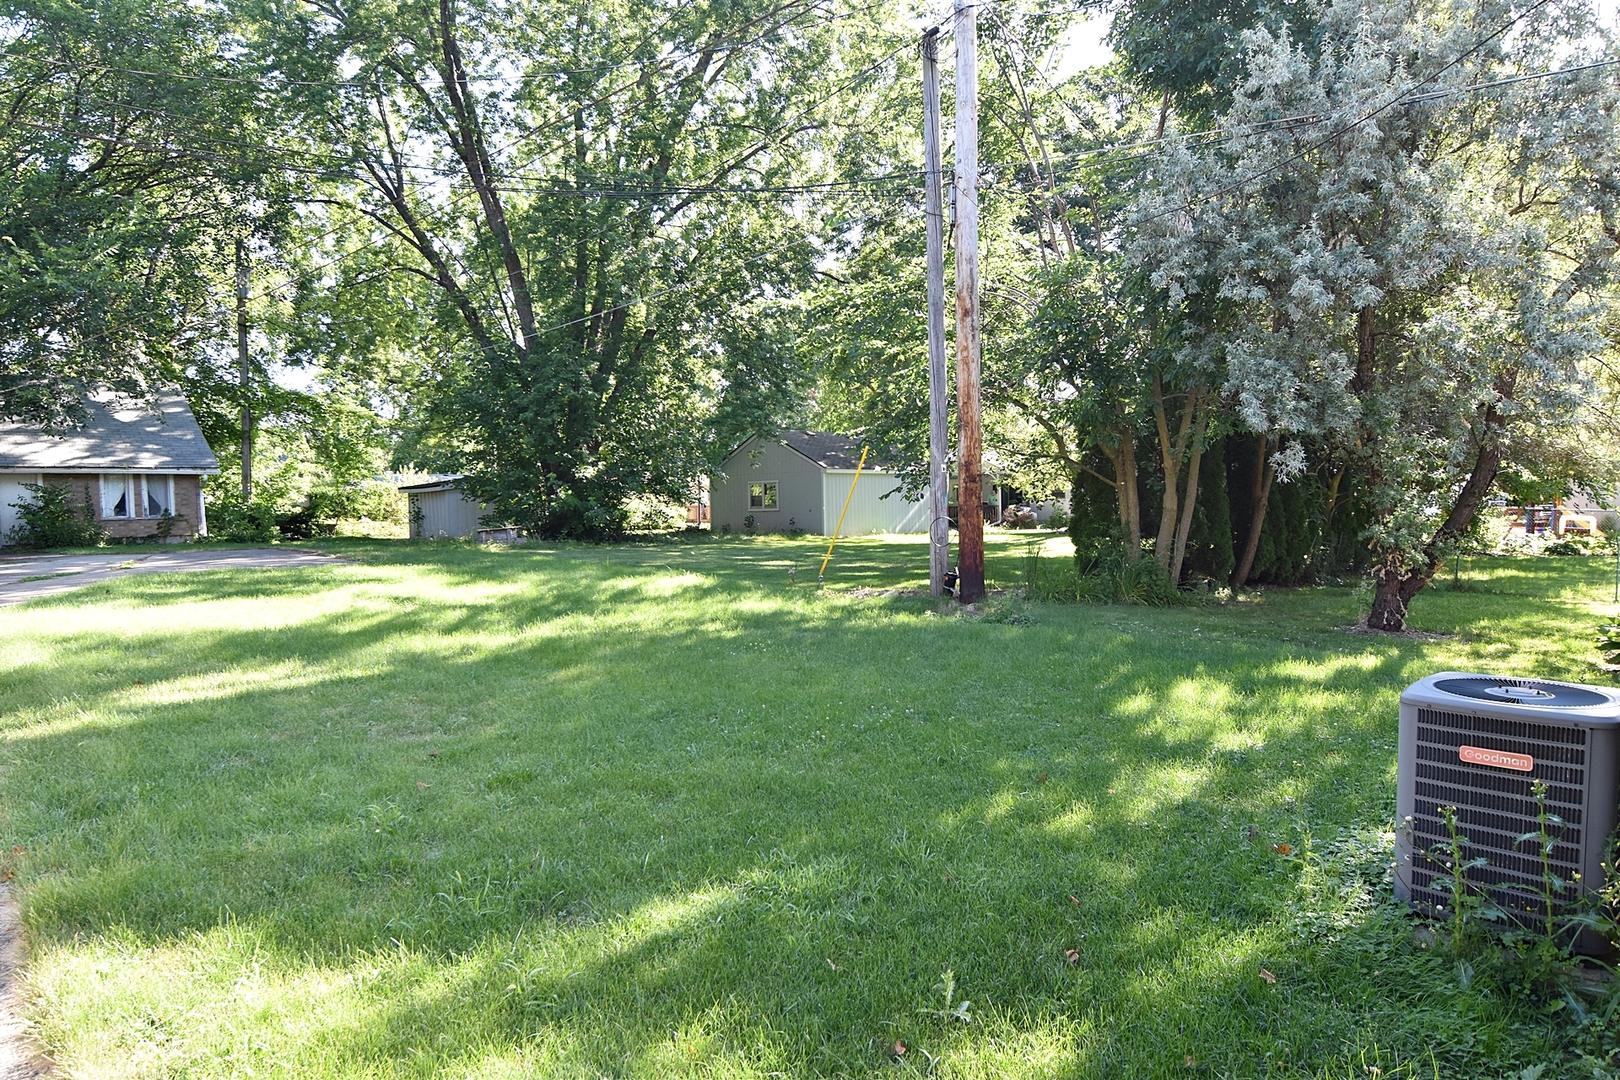 84 McKinley, ST. CHARLES, Illinois, 60174